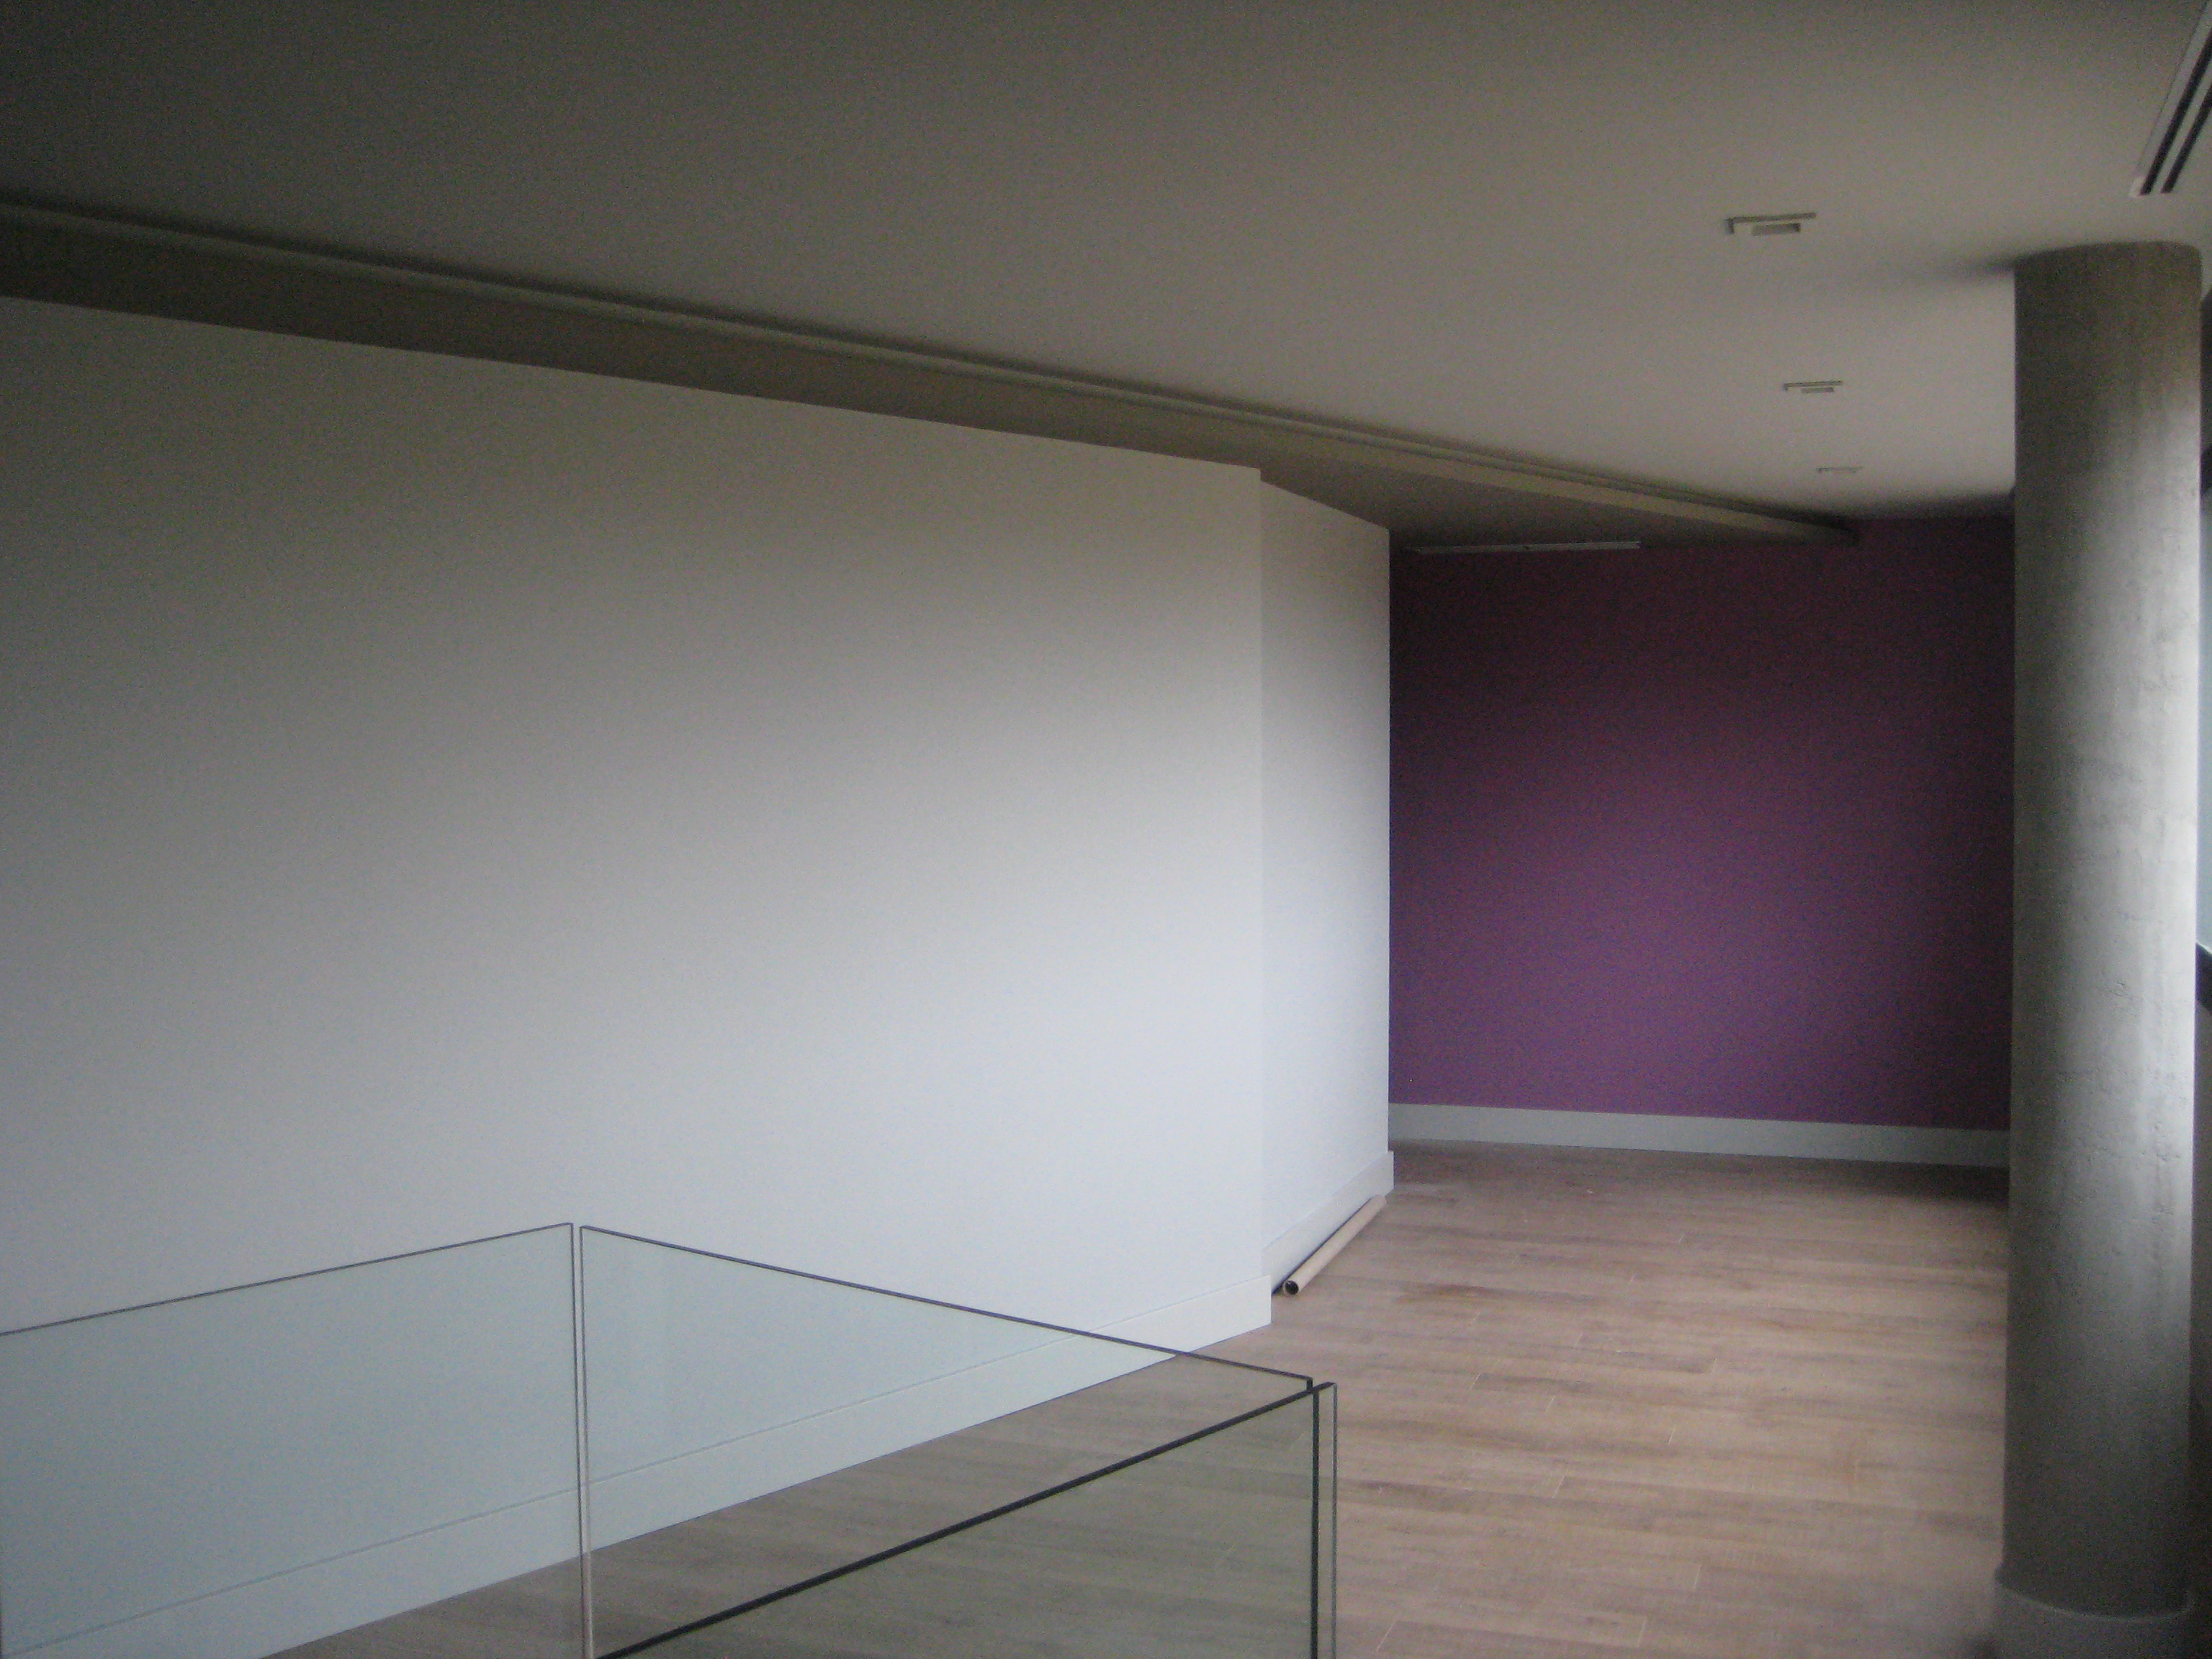 Pintores profesionales Madrid | Pinturas Oscar, empresa de pintura ...